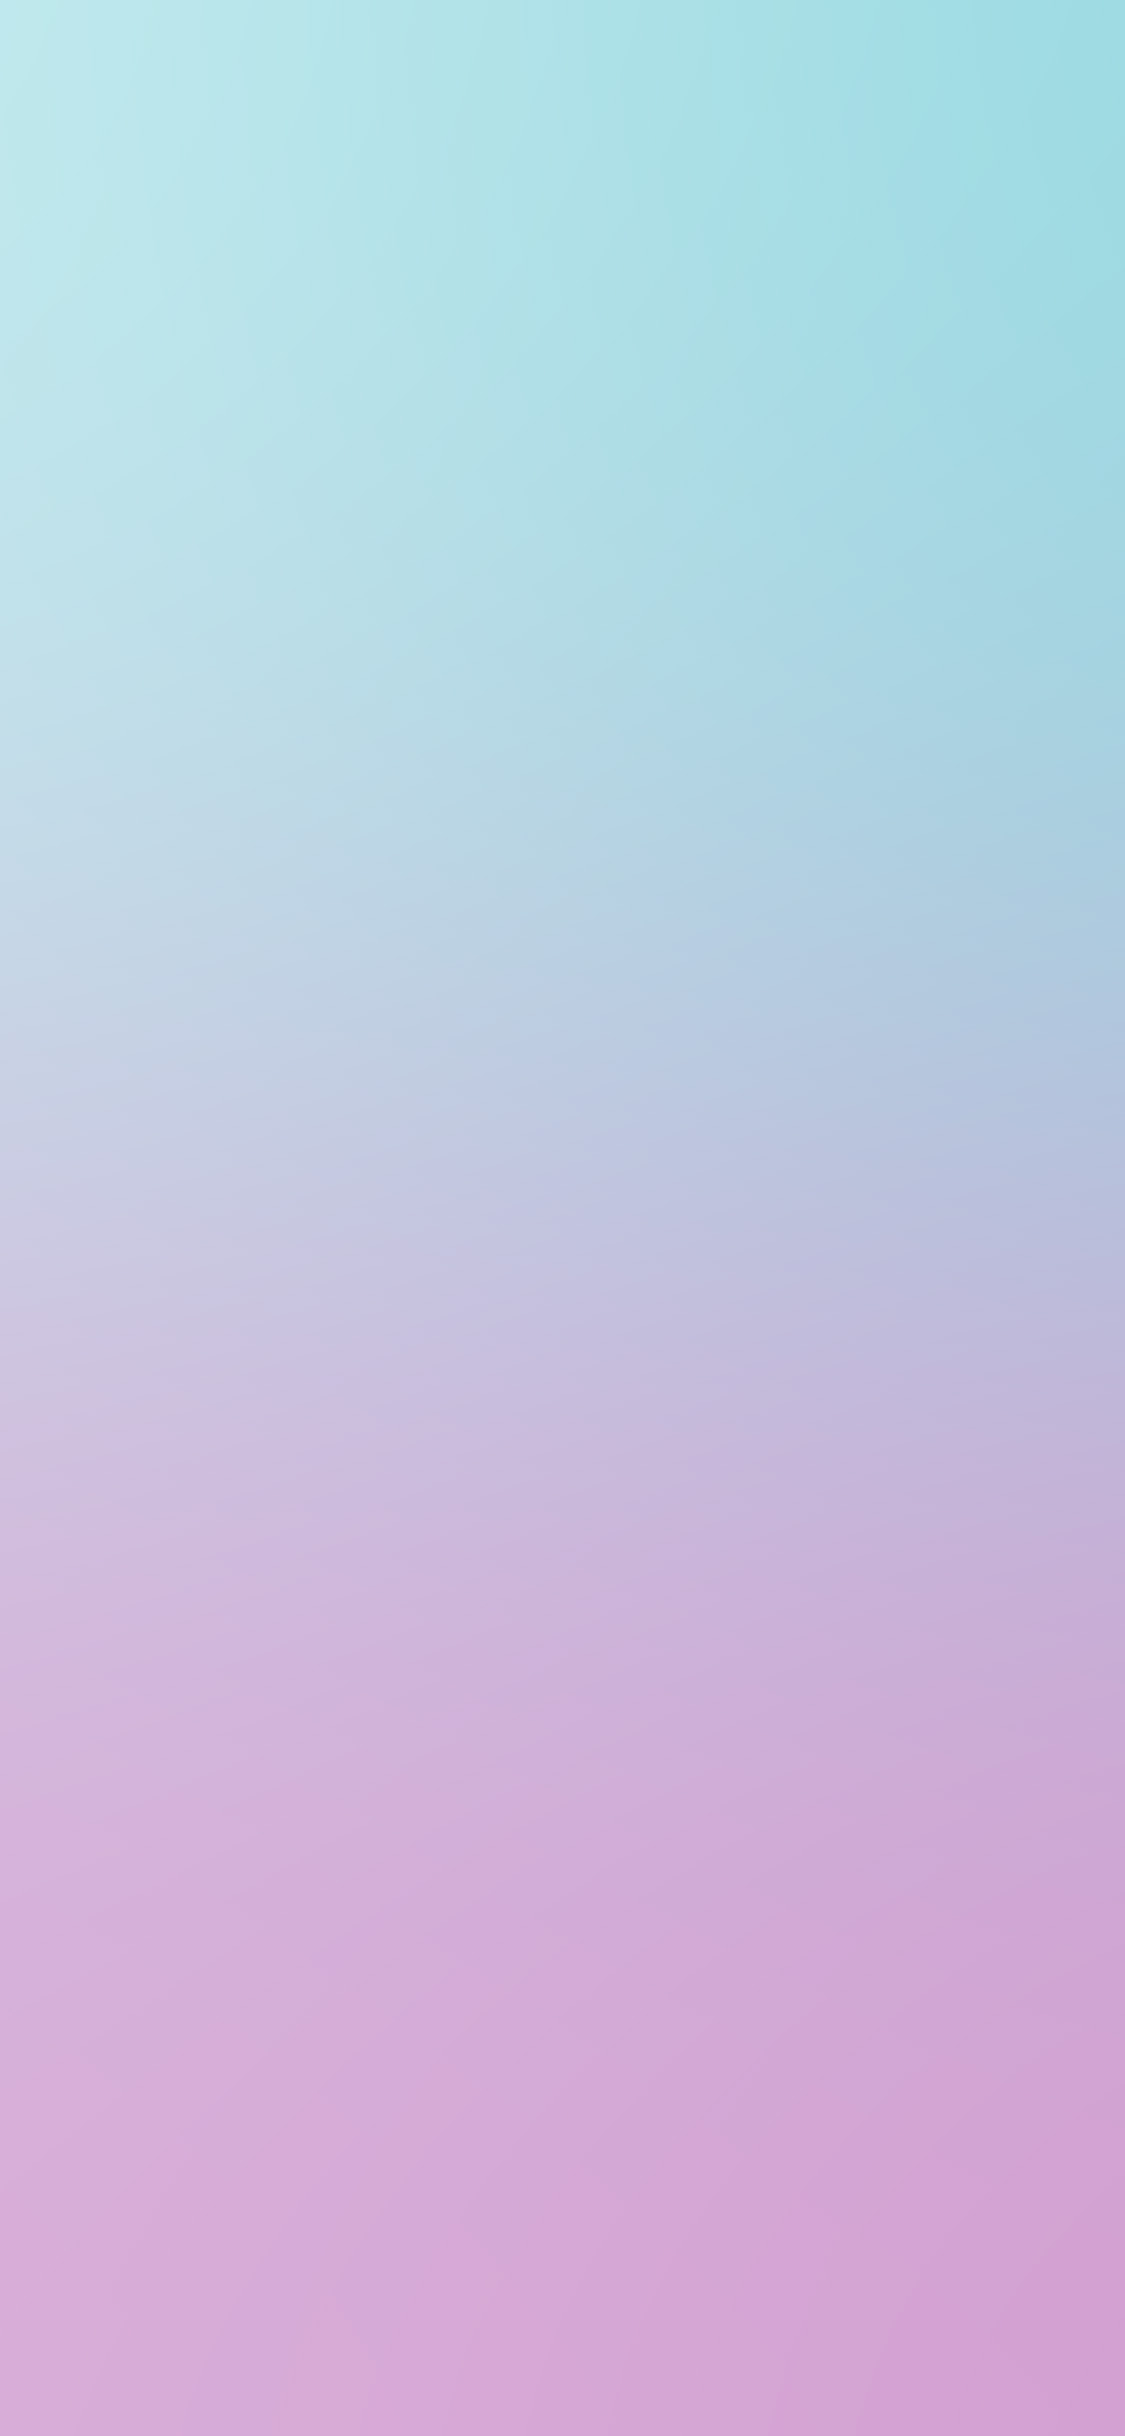 iPhonexpapers.com-Apple-iPhone-wallpaper-so11-white-purple-soft-pastel-blur-gradation